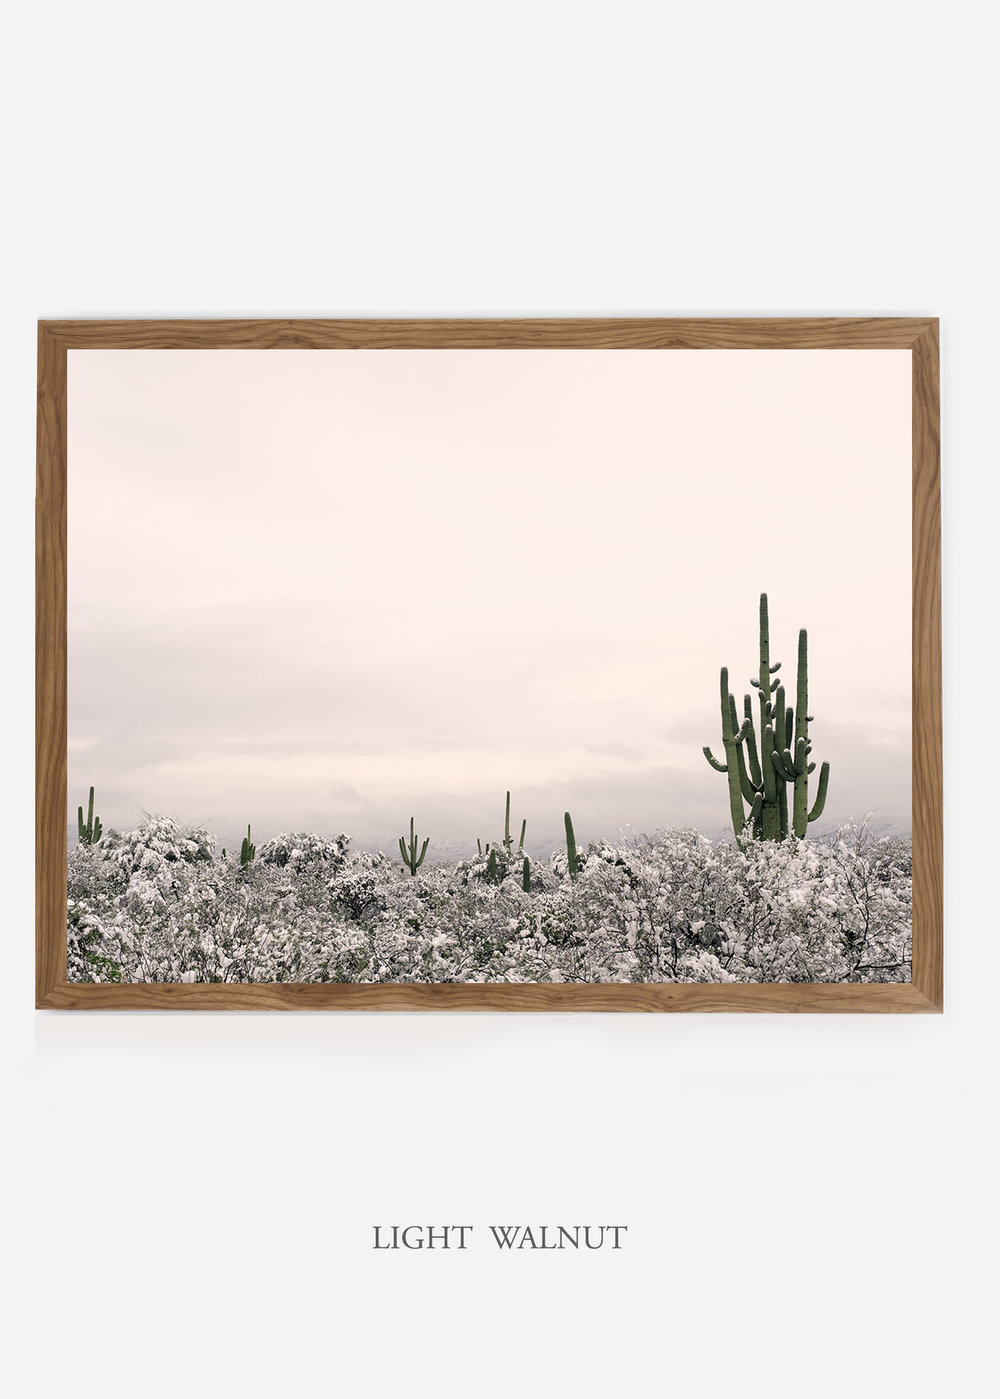 nomat_lightwalnutframe-saguaroNo.7-wildercalifornia-art-wallart-cactusprint-homedecor-prints-arizona-botanical-artwork-interiordesign.jpg